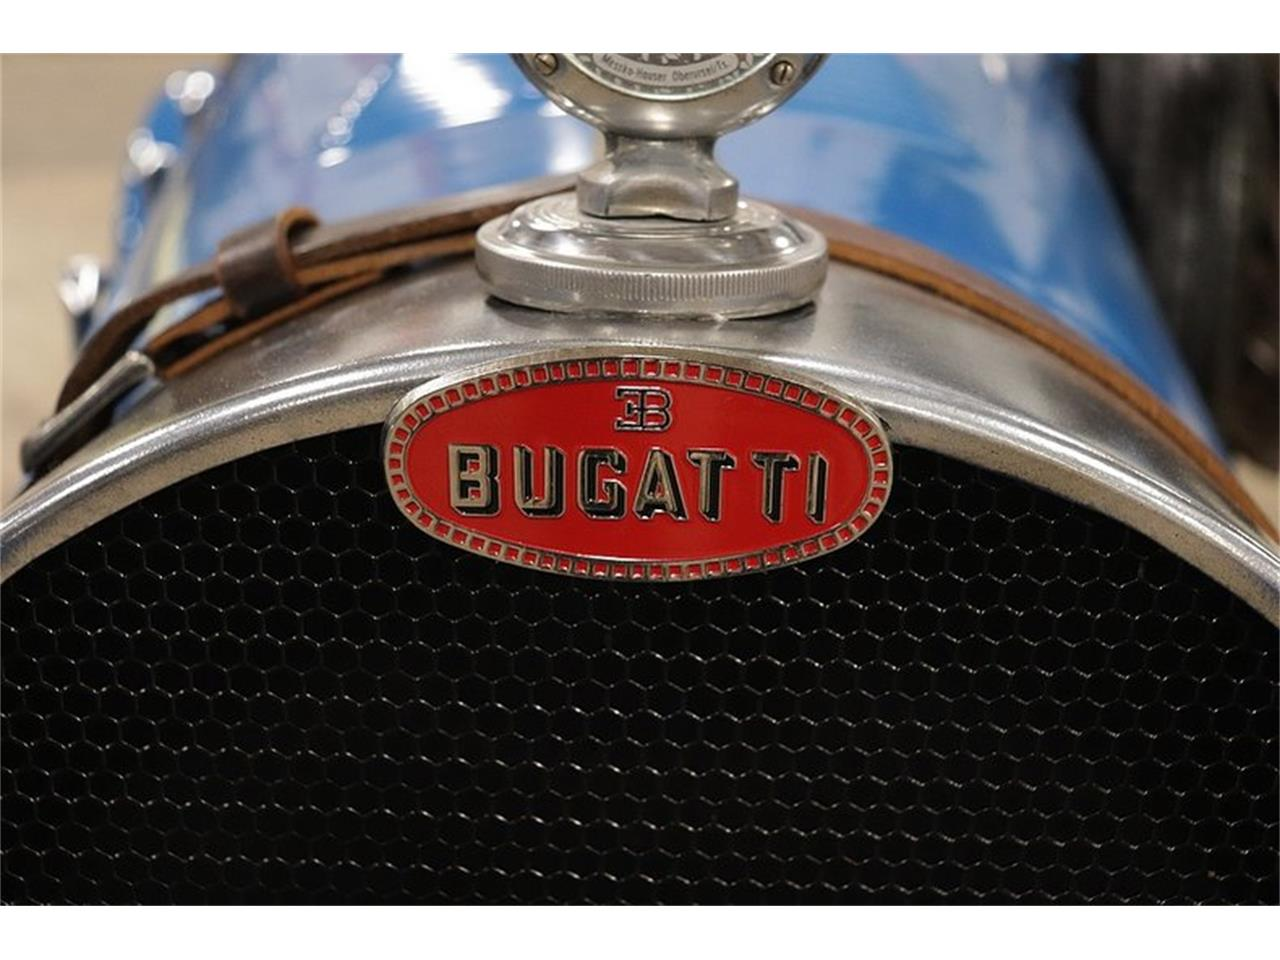 Large Picture of 1925 Bugatti Type 35 located in Michigan - $27,900.00 - P93G